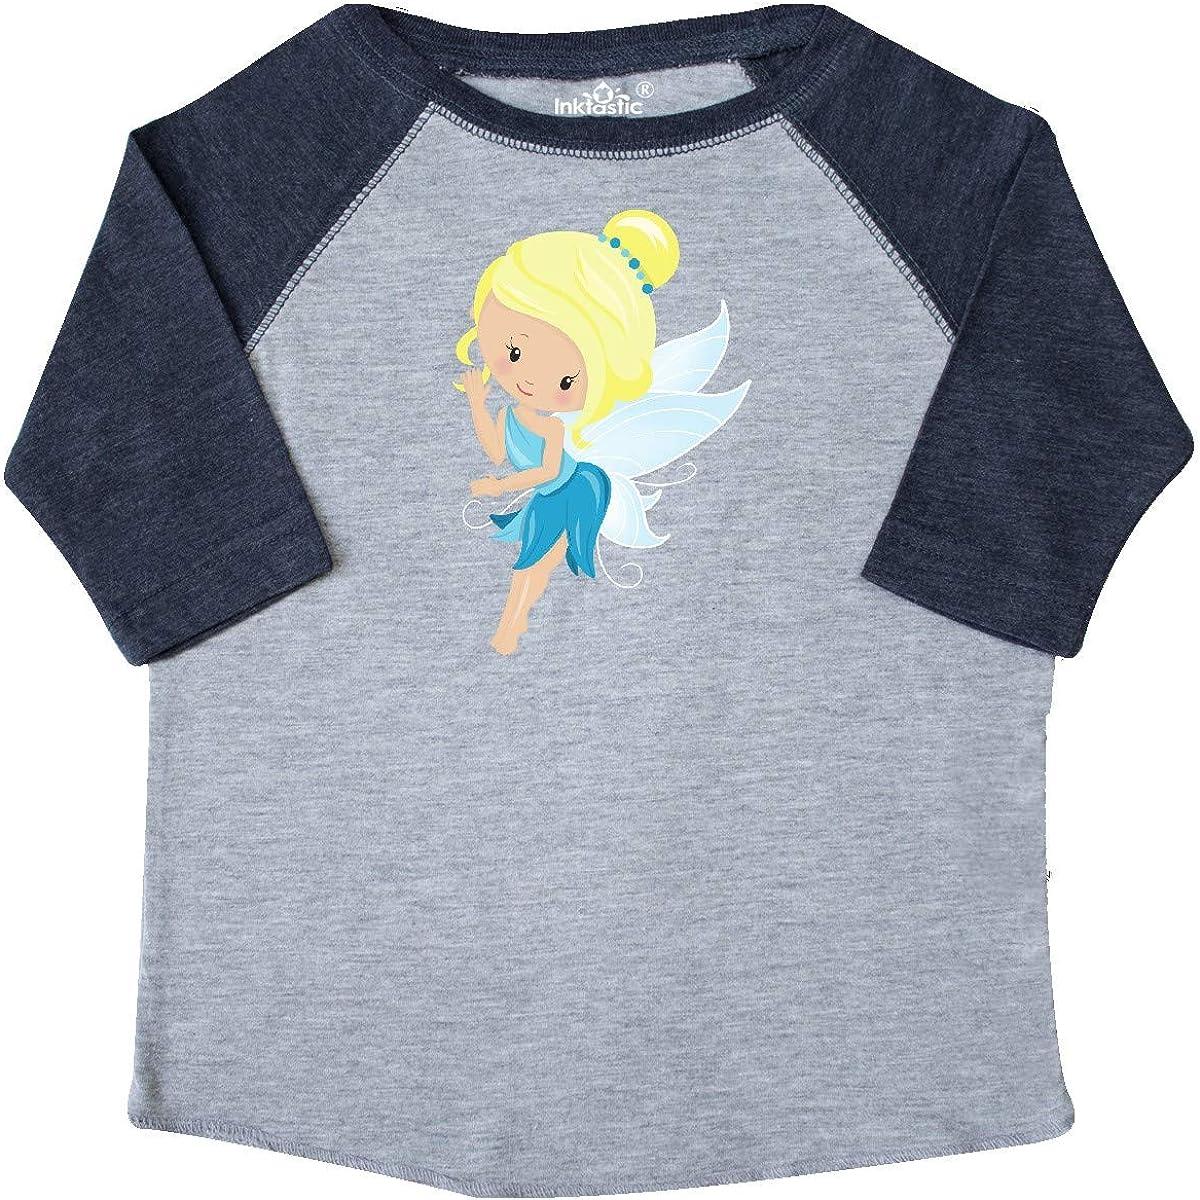 Fairy in Blue Dress Toddler T-Shirt Blonde Hair inktastic Cute Fairy